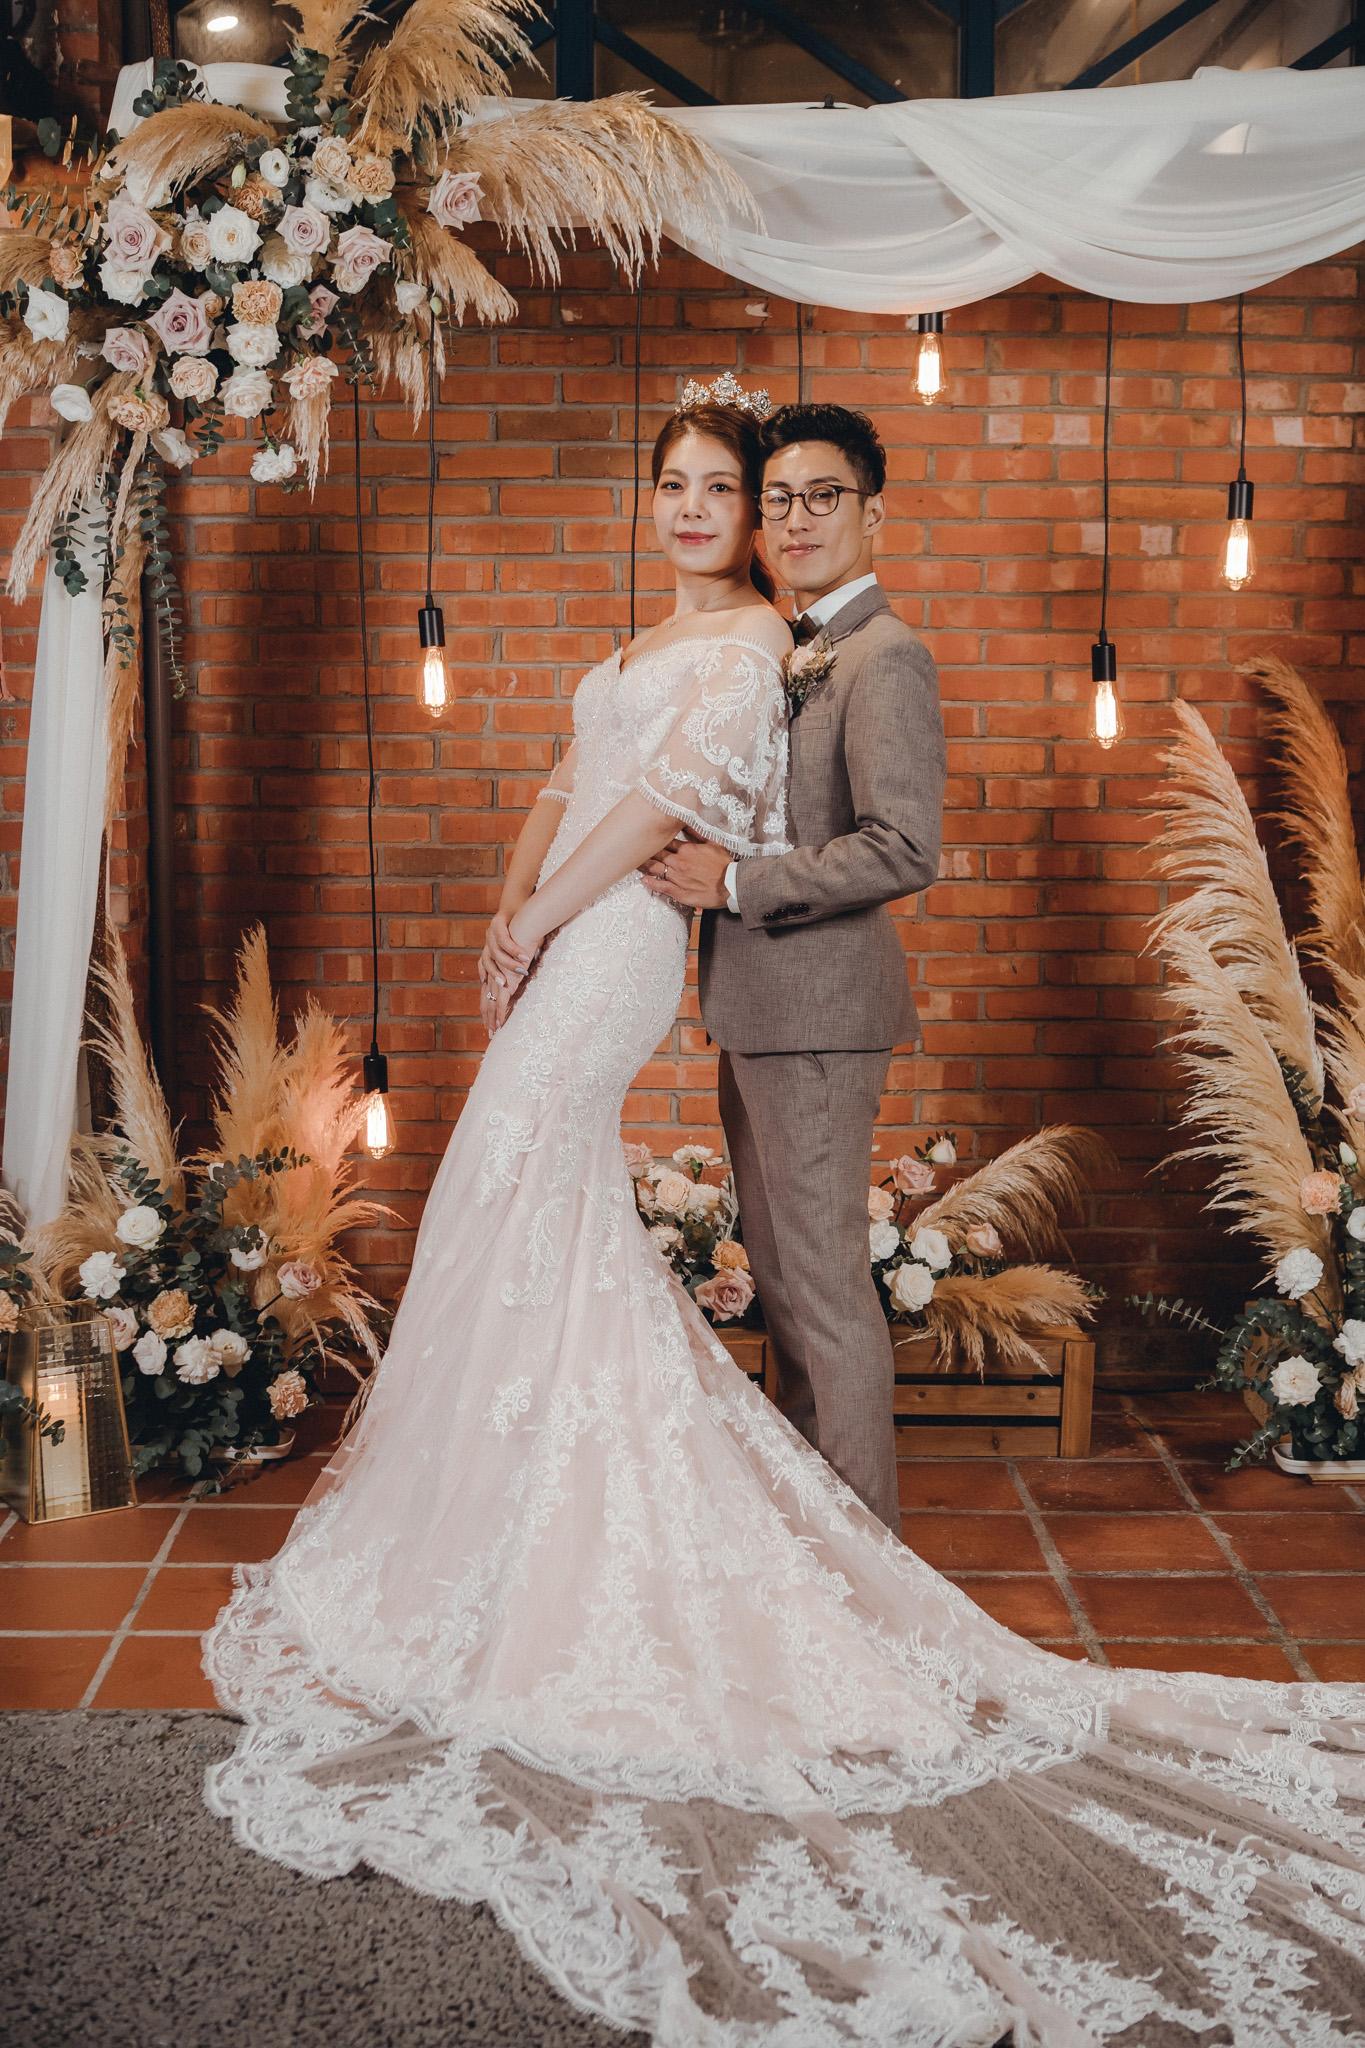 EW 台北婚攝 居米 濟南教會 Brick Yard 33 美軍俱樂部 婚禮 婚宴-117